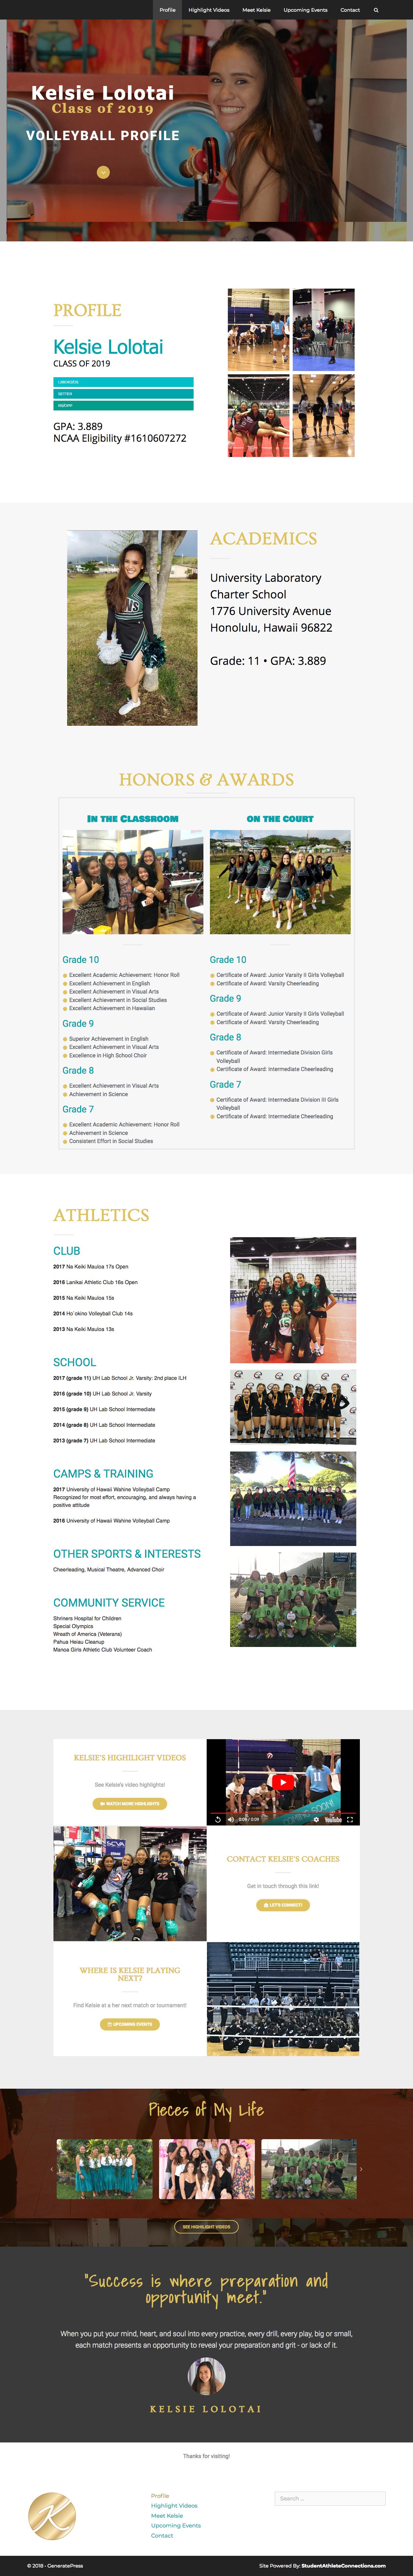 student athlete volleyball websites - kelsielolotai